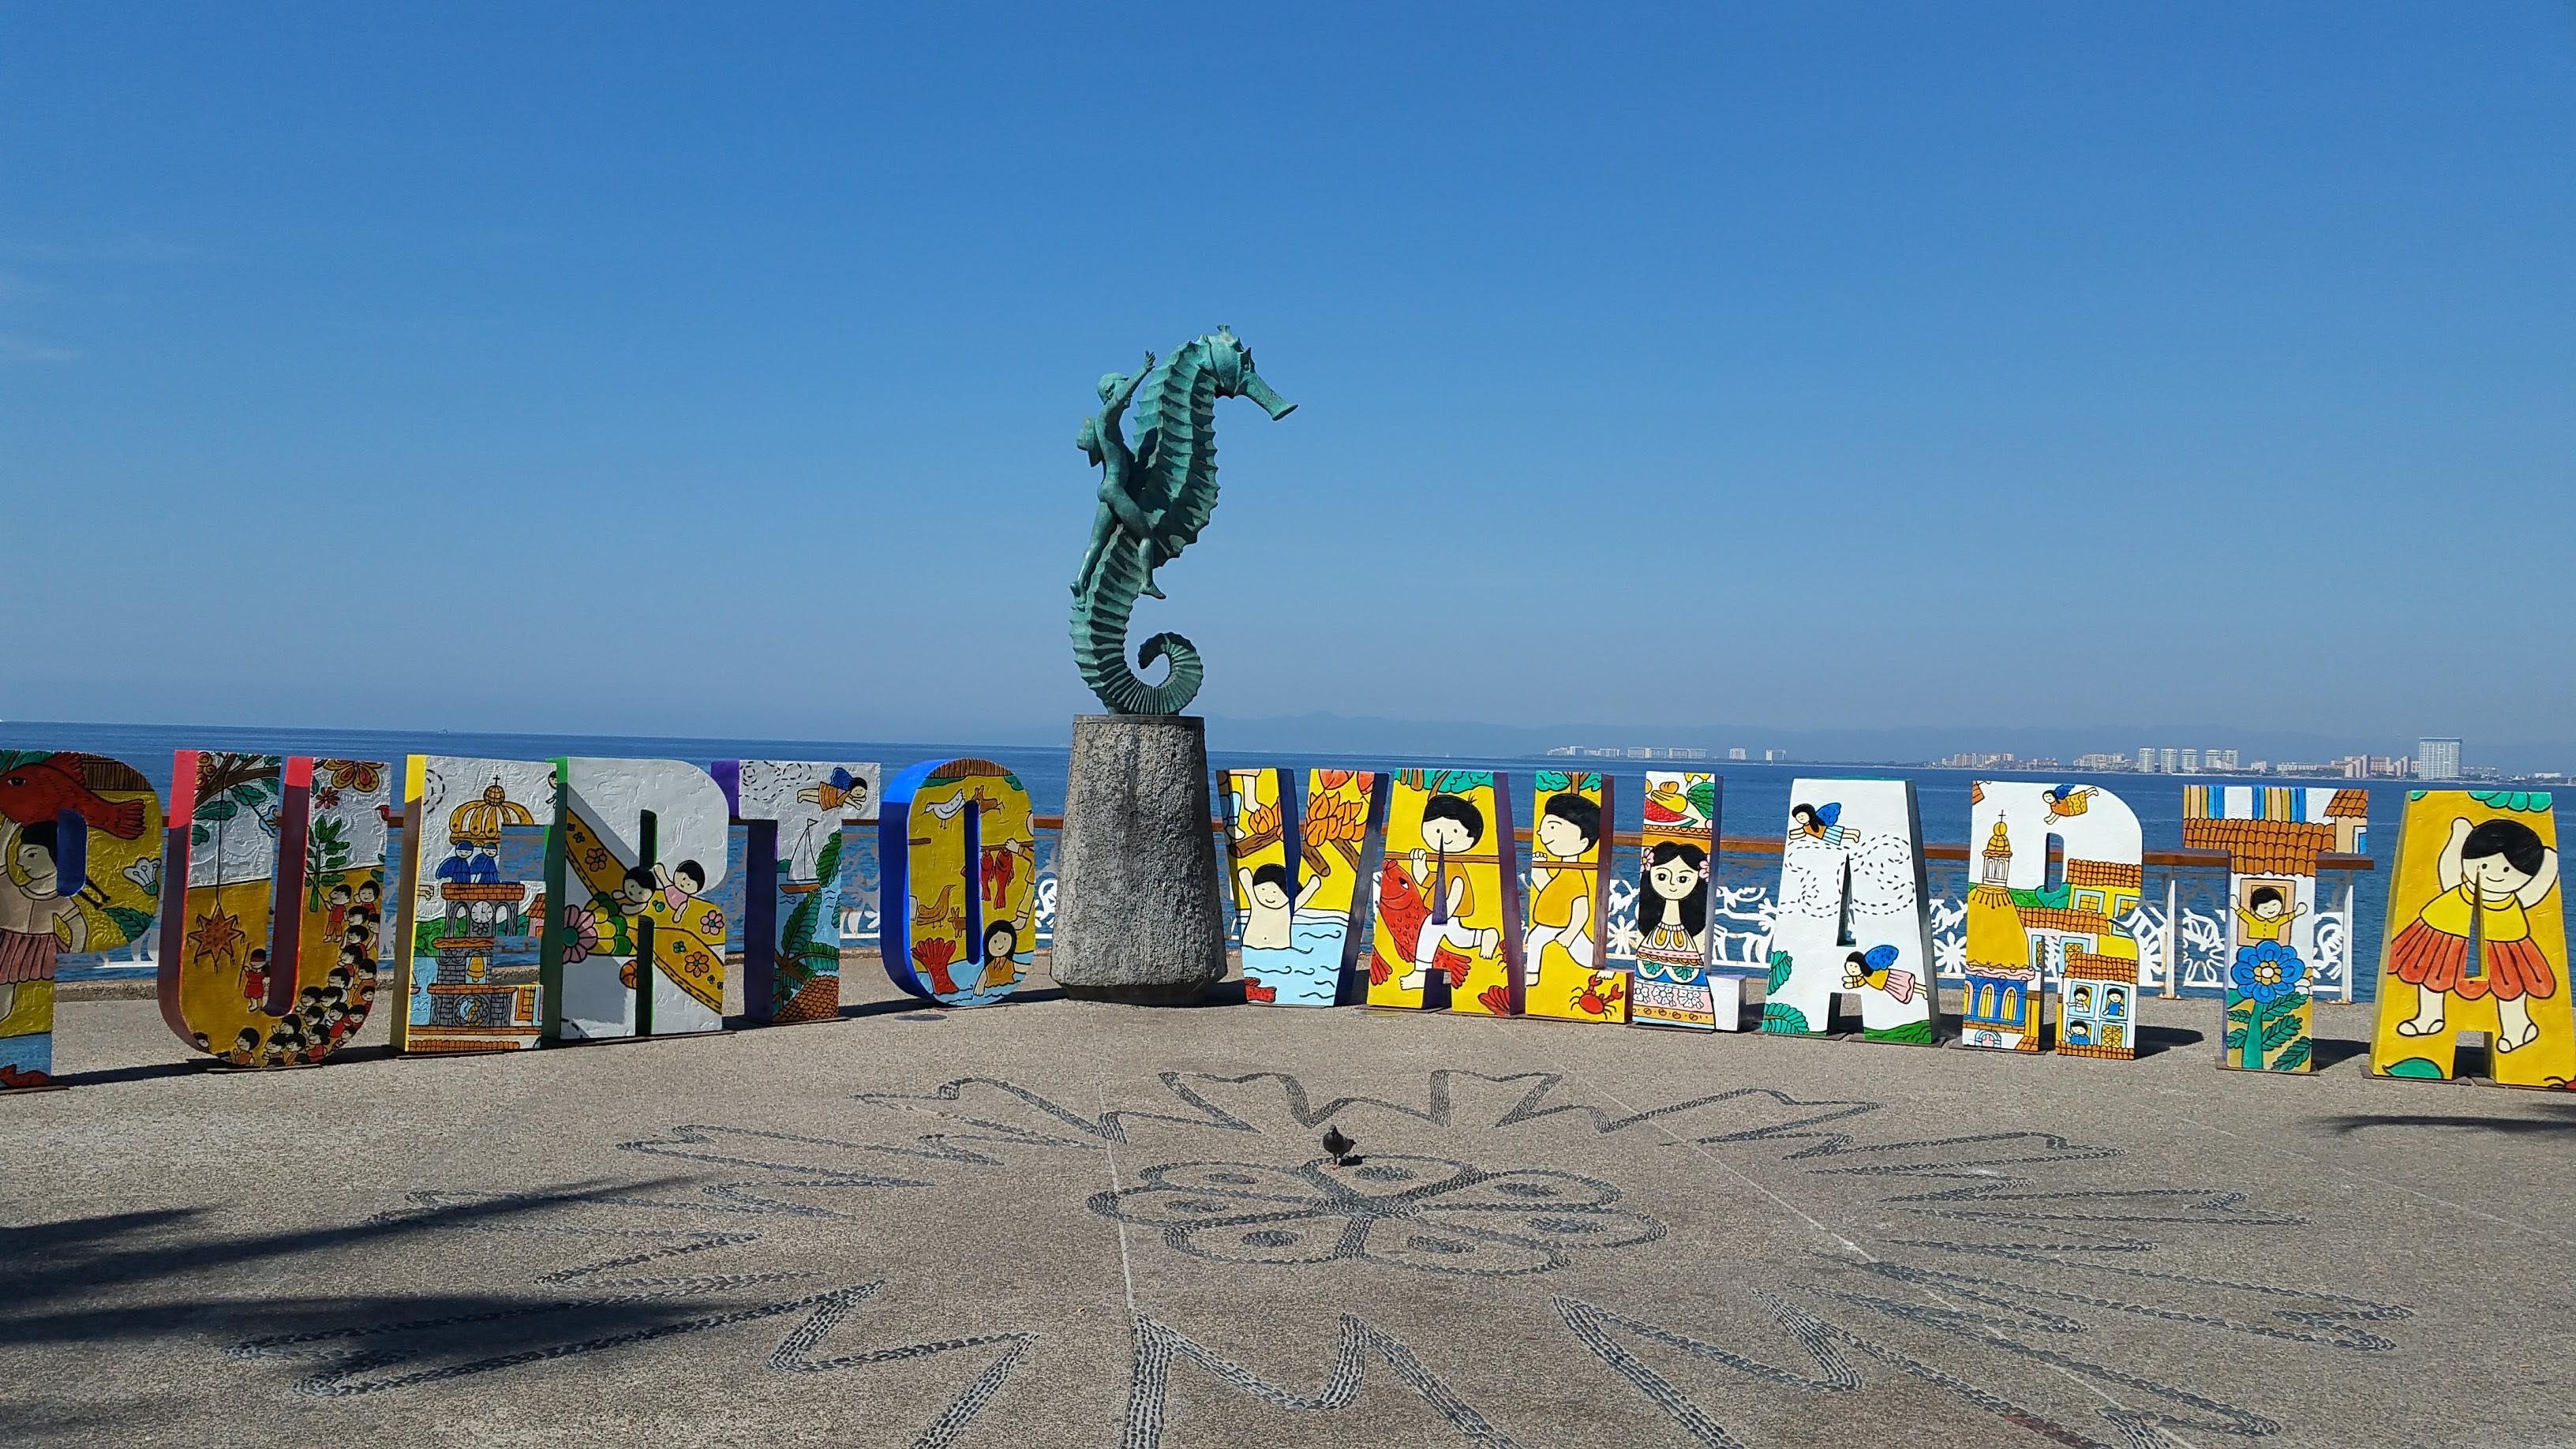 Puerto Vallarta Mexico In December Diane Uke Shares